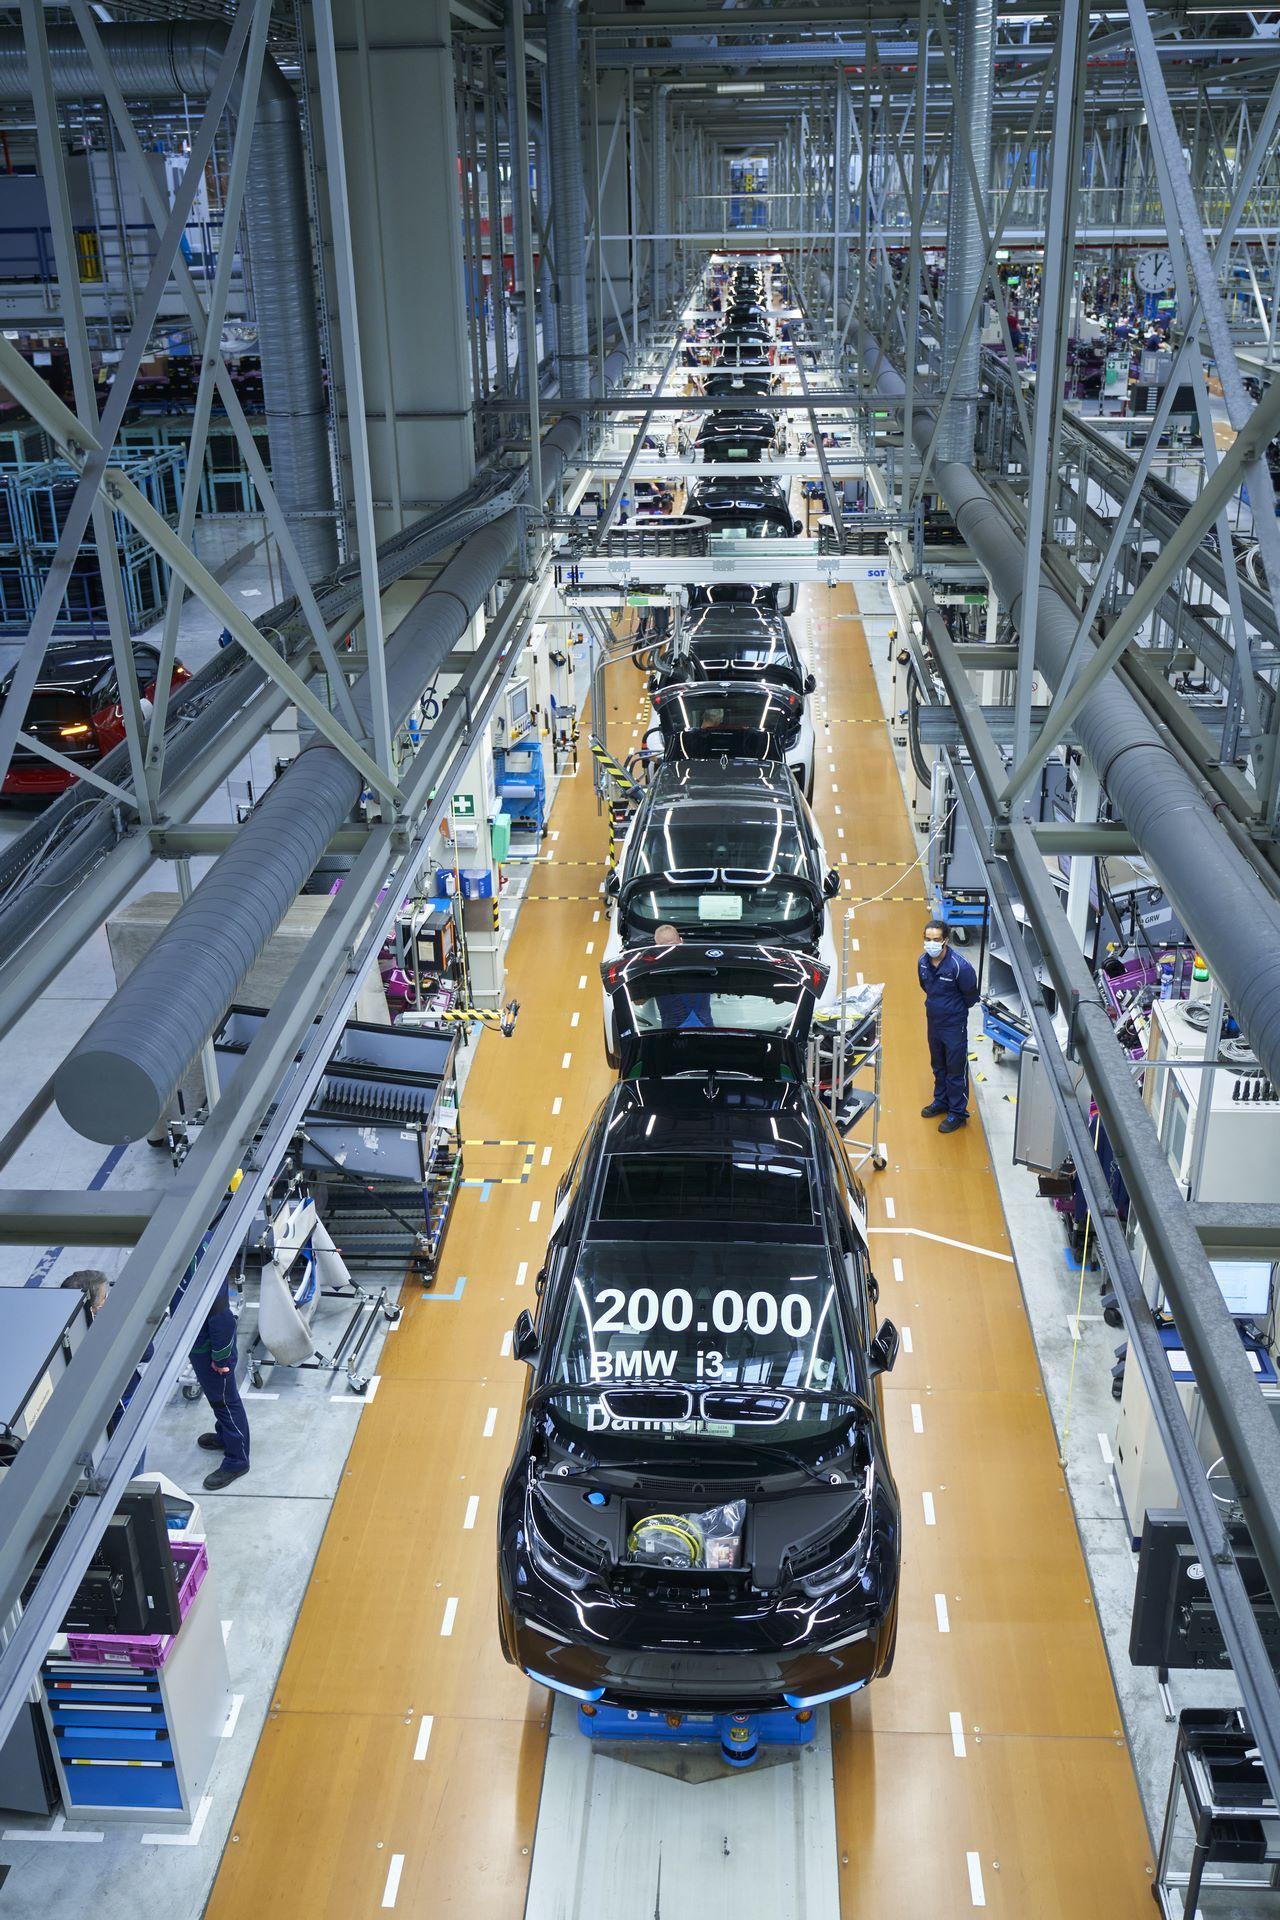 BMW-i8-plant-production-41